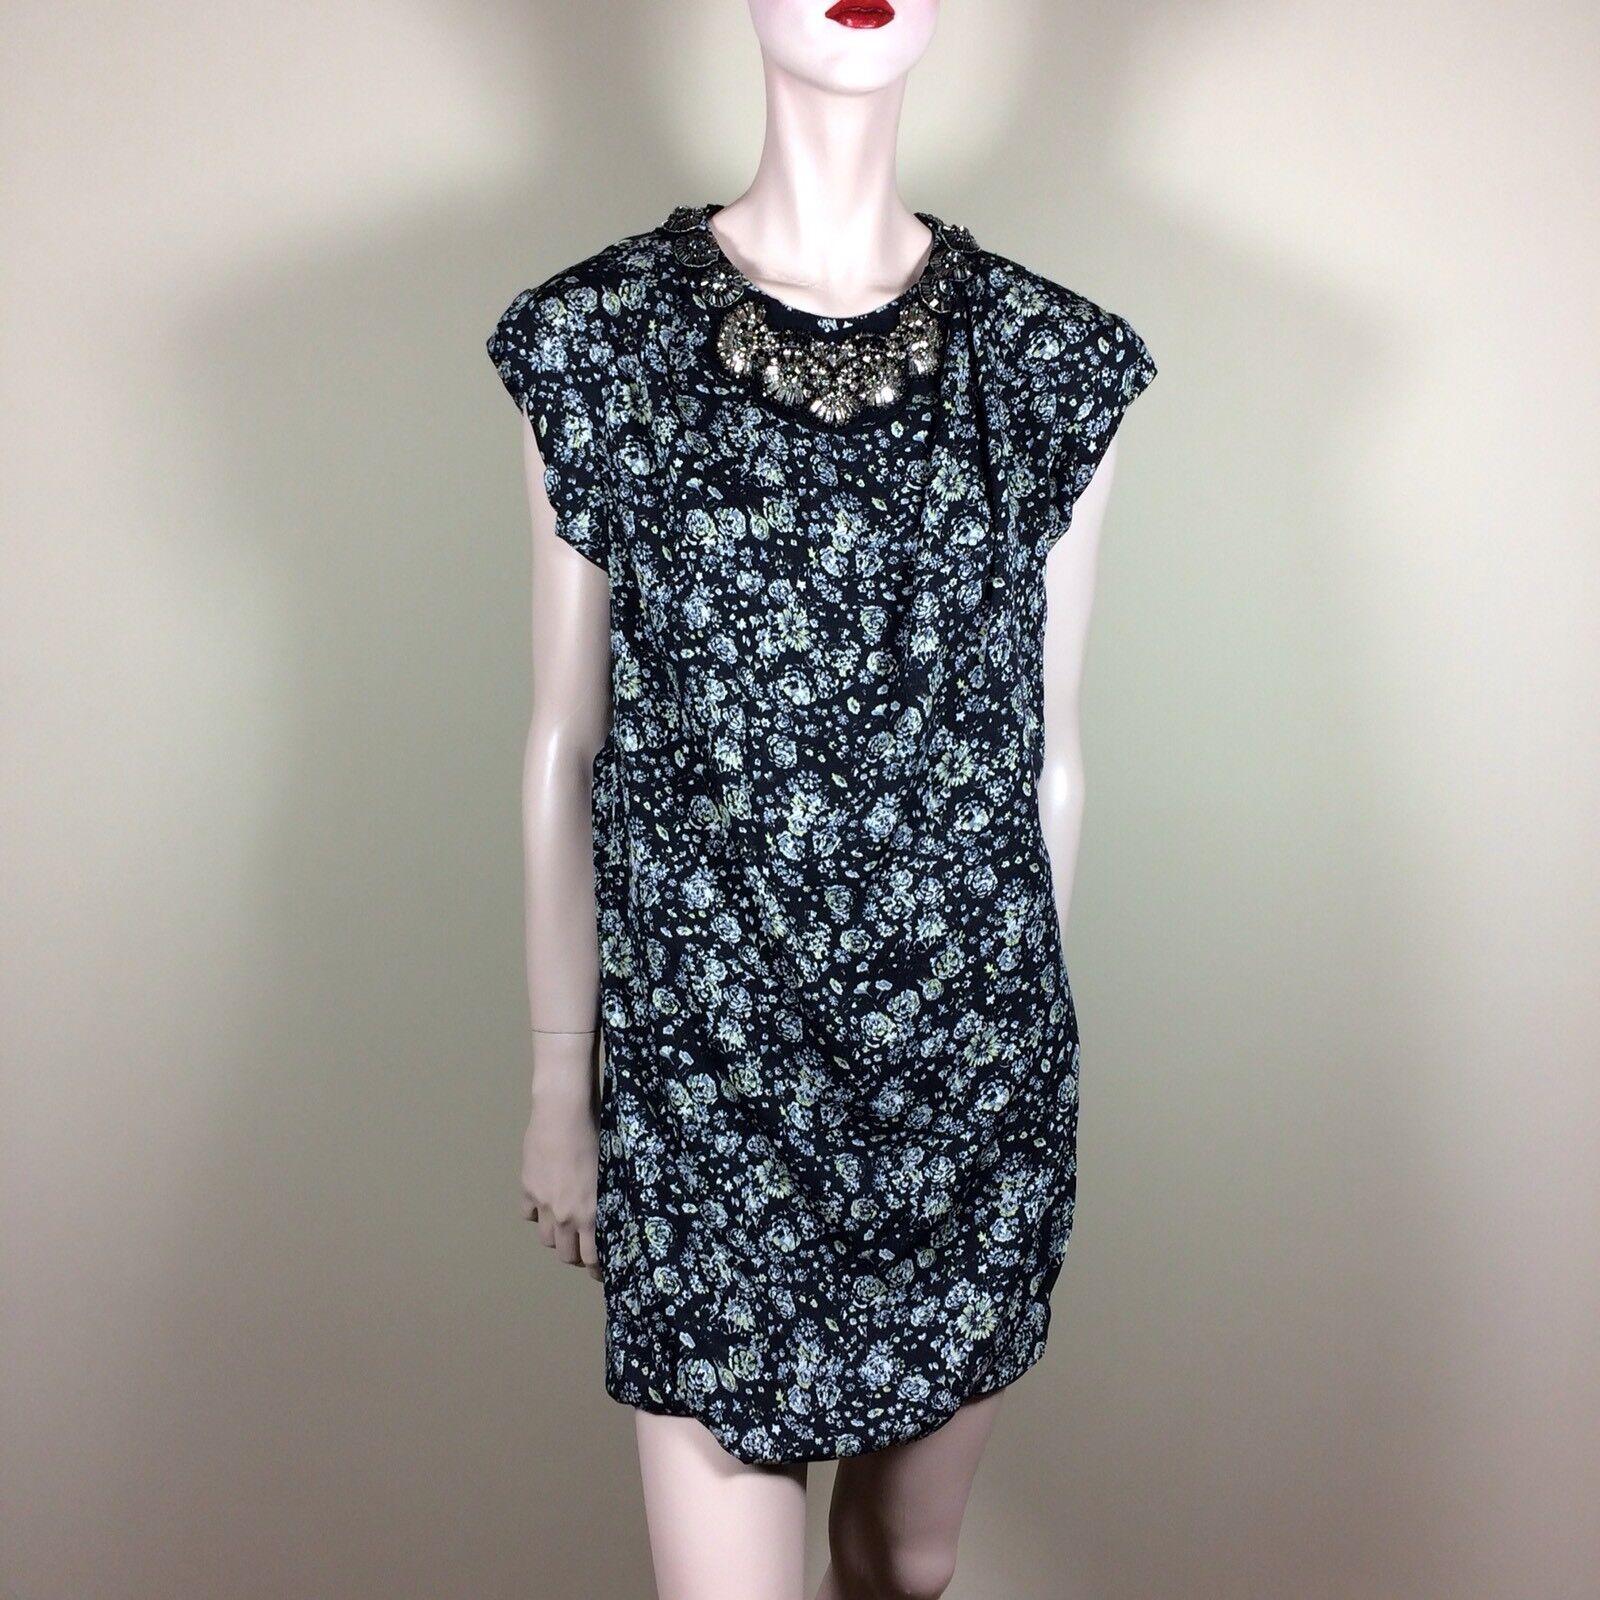 PHILLIP LIM Damen Kleid S 36 Schwarz Geblümt Tunika Top Eleganter Glamour Style